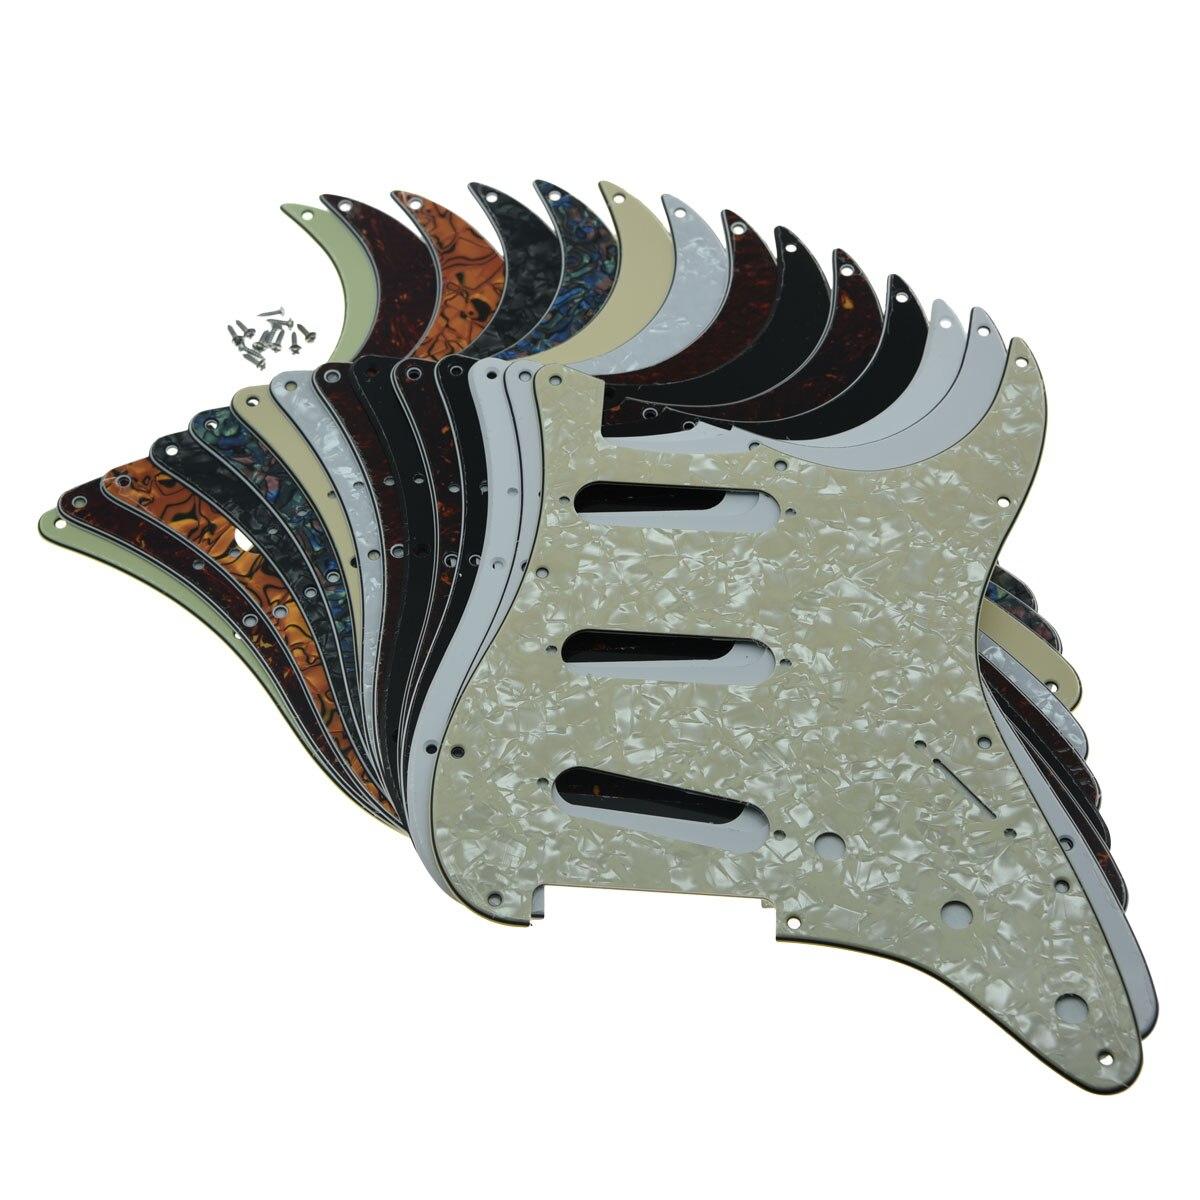 KAISH 11 Отверстие Strat ST SSS одна катушка пикапы гитара Защита от царапин пластина с винтами для американского Fender 62 Stratocaster